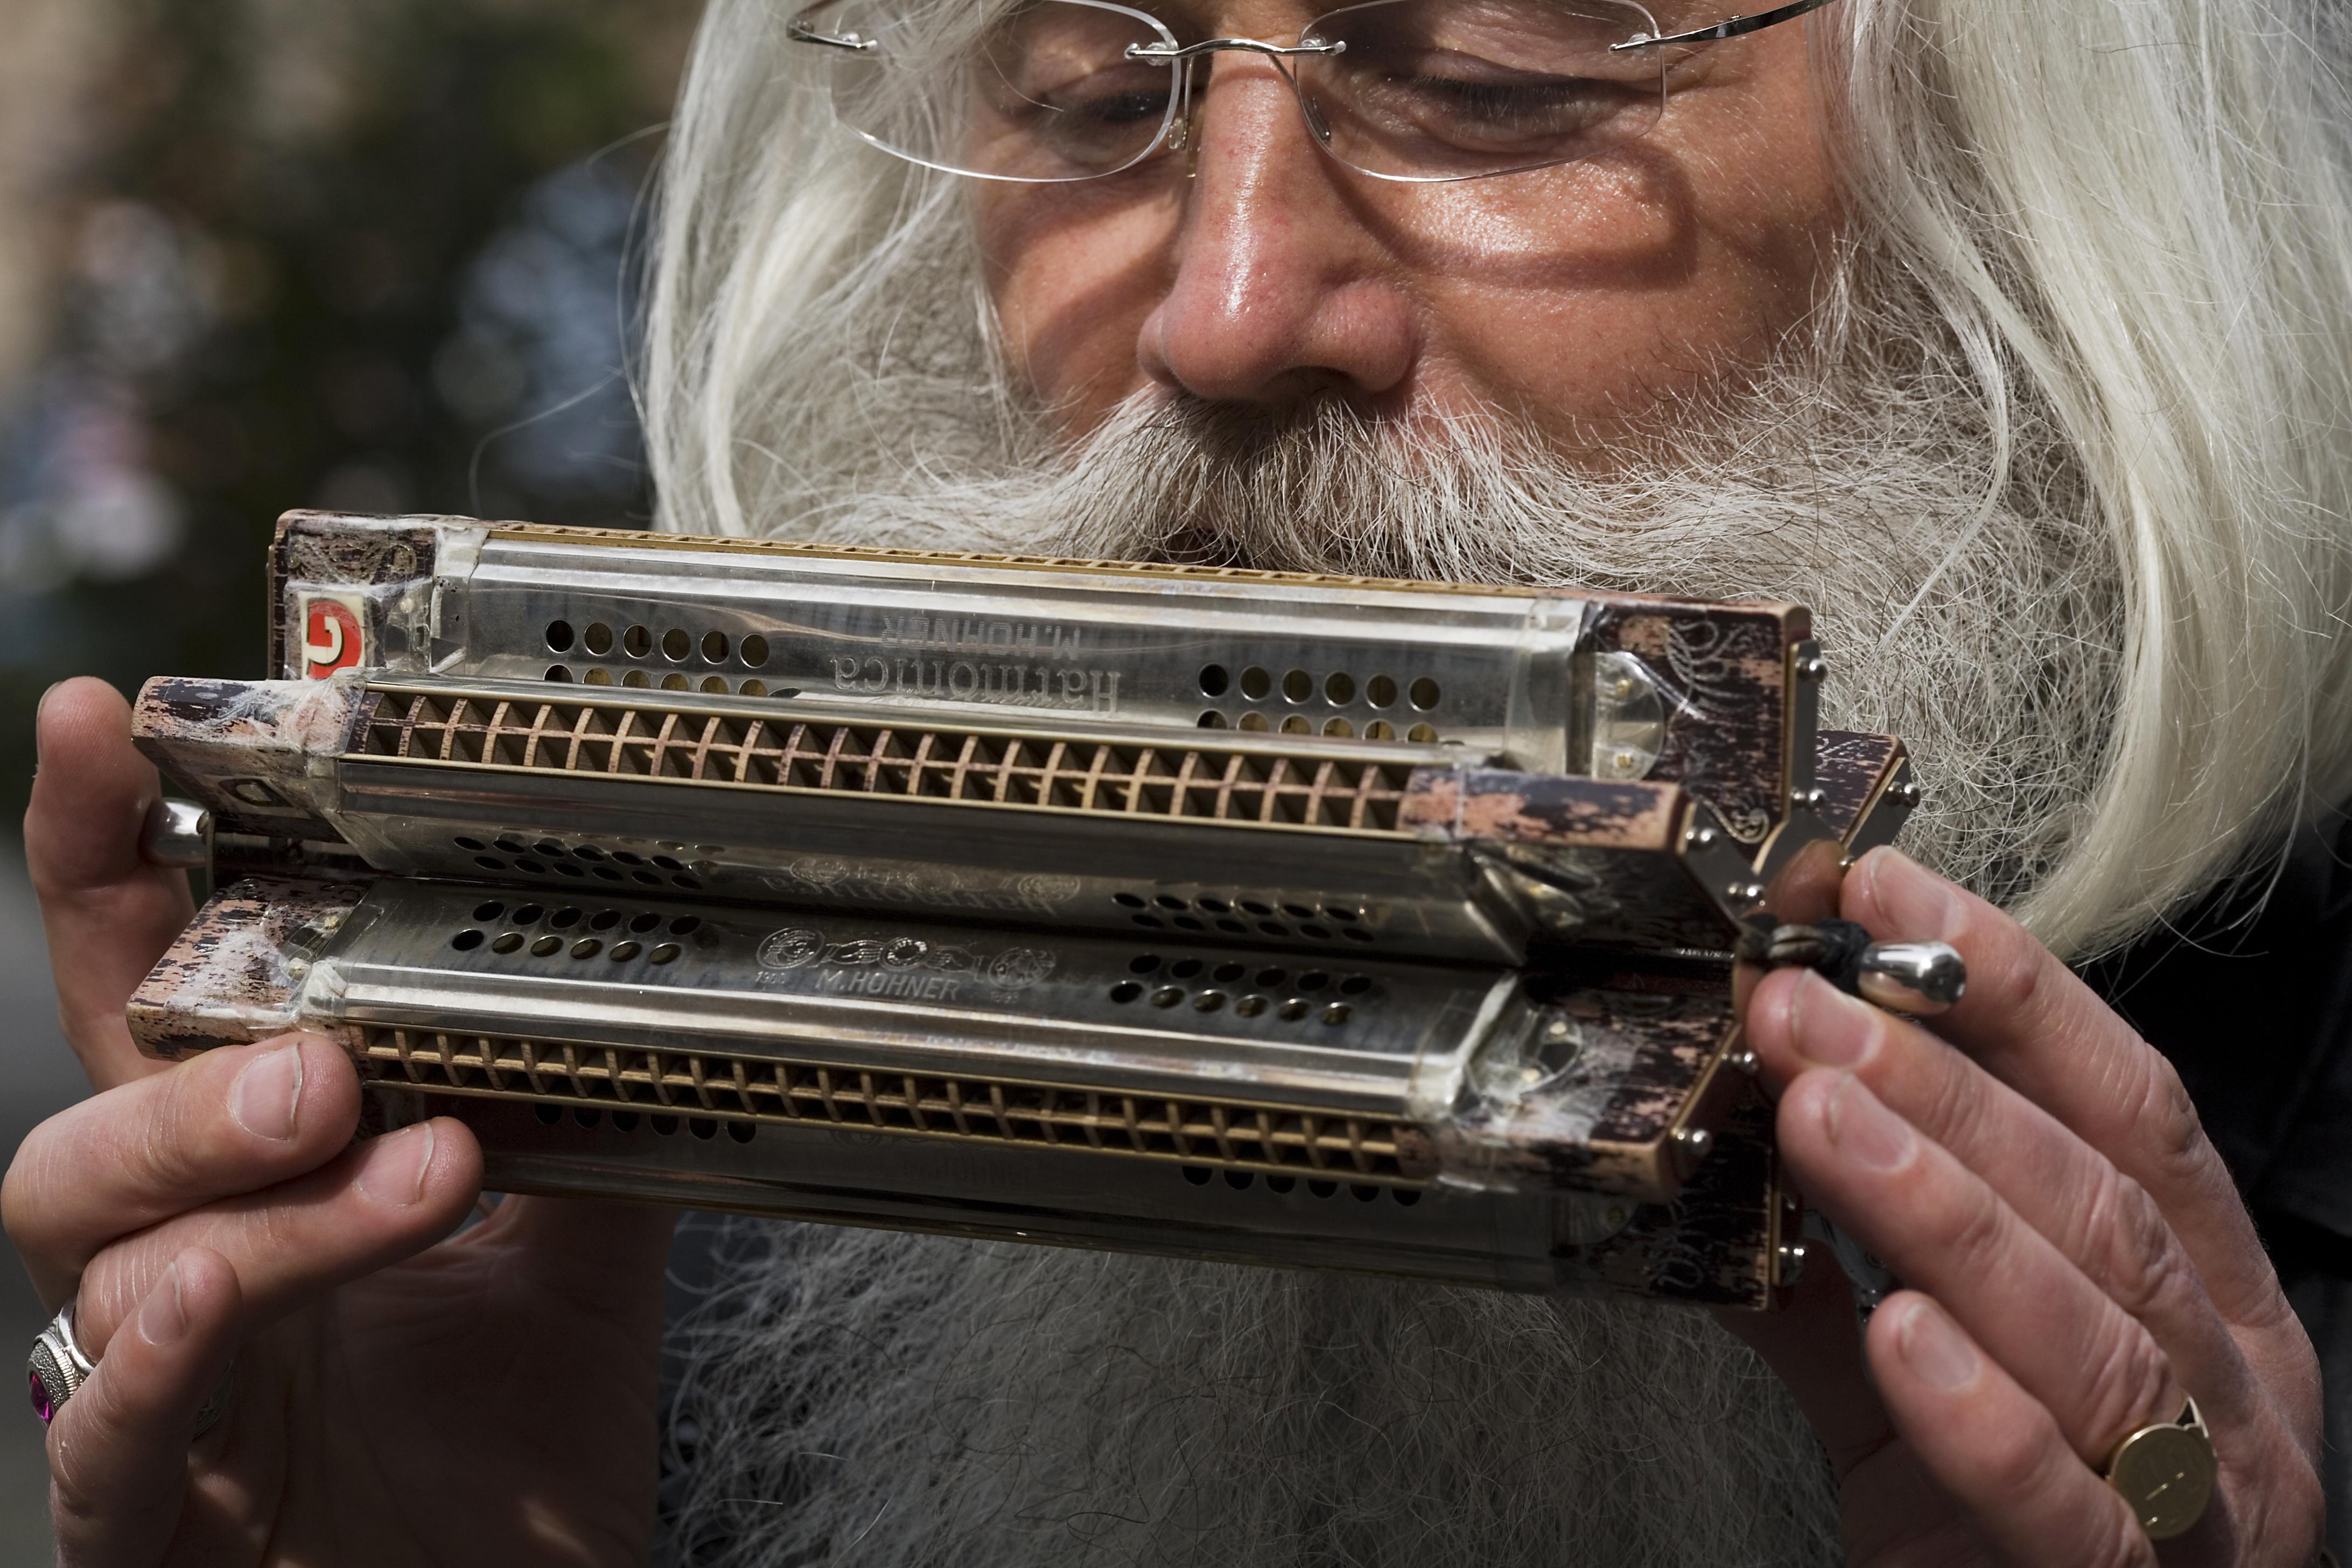 Play the harmonica - 1 6